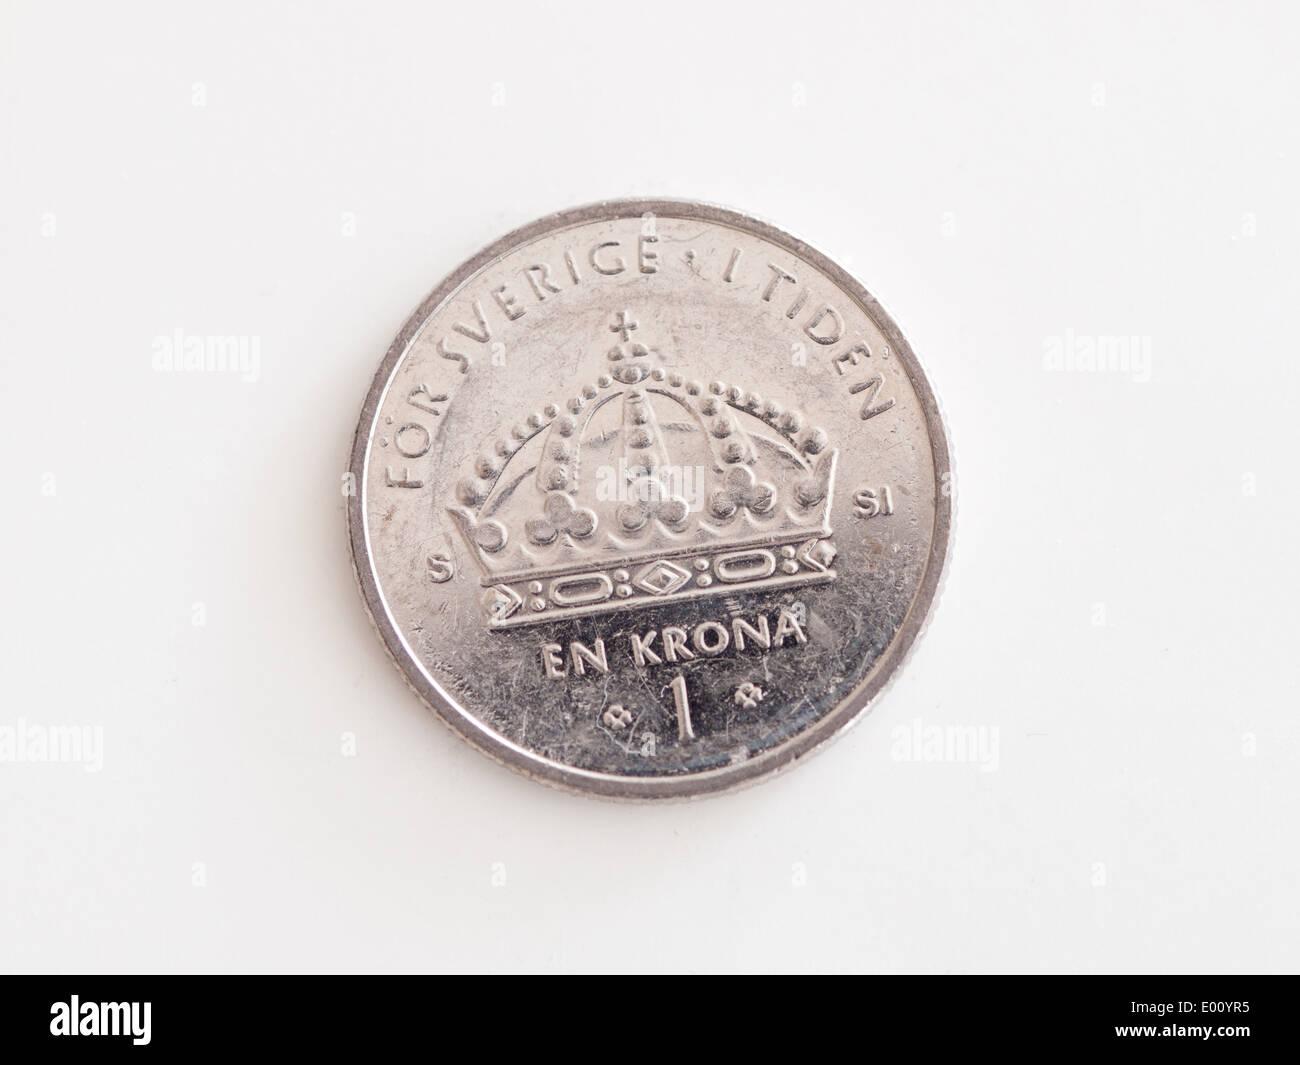 A Swedish one krona coin. - Stock Image